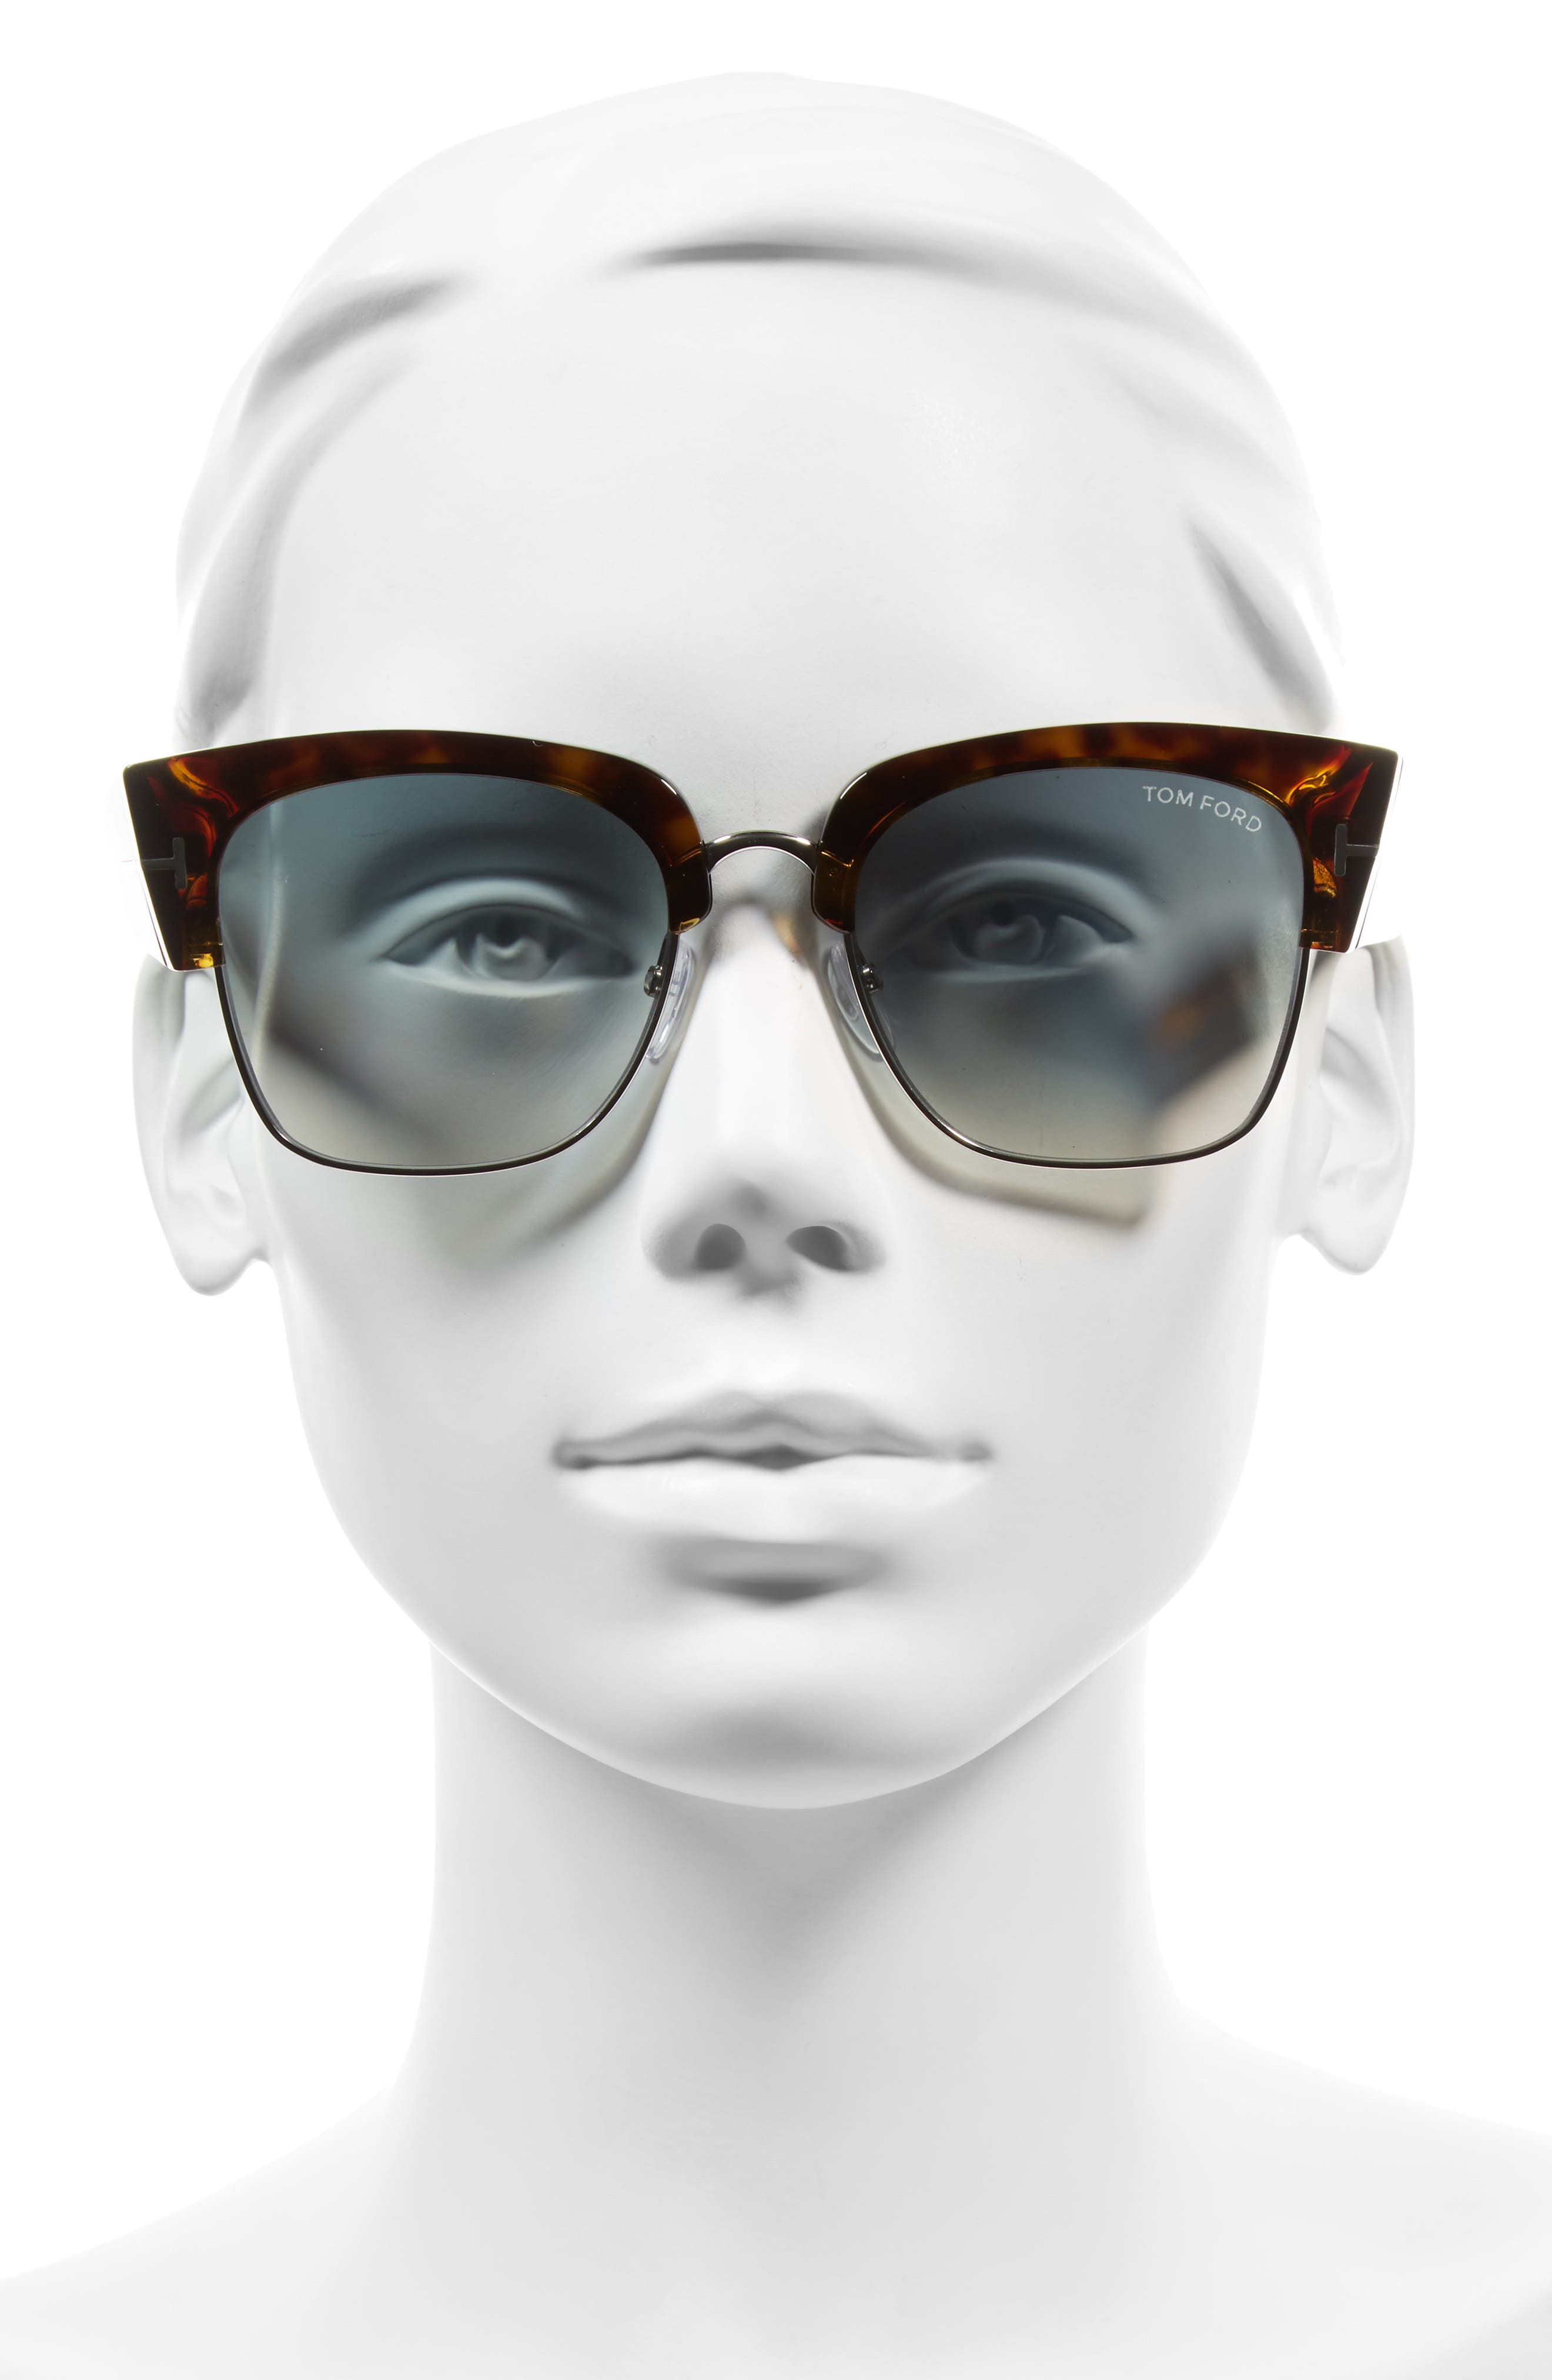 Dakota 55mm Gradient Square Sunglasses,                             Alternate thumbnail 2, color,                             DARK HAVANA/ BLUE MIRROR